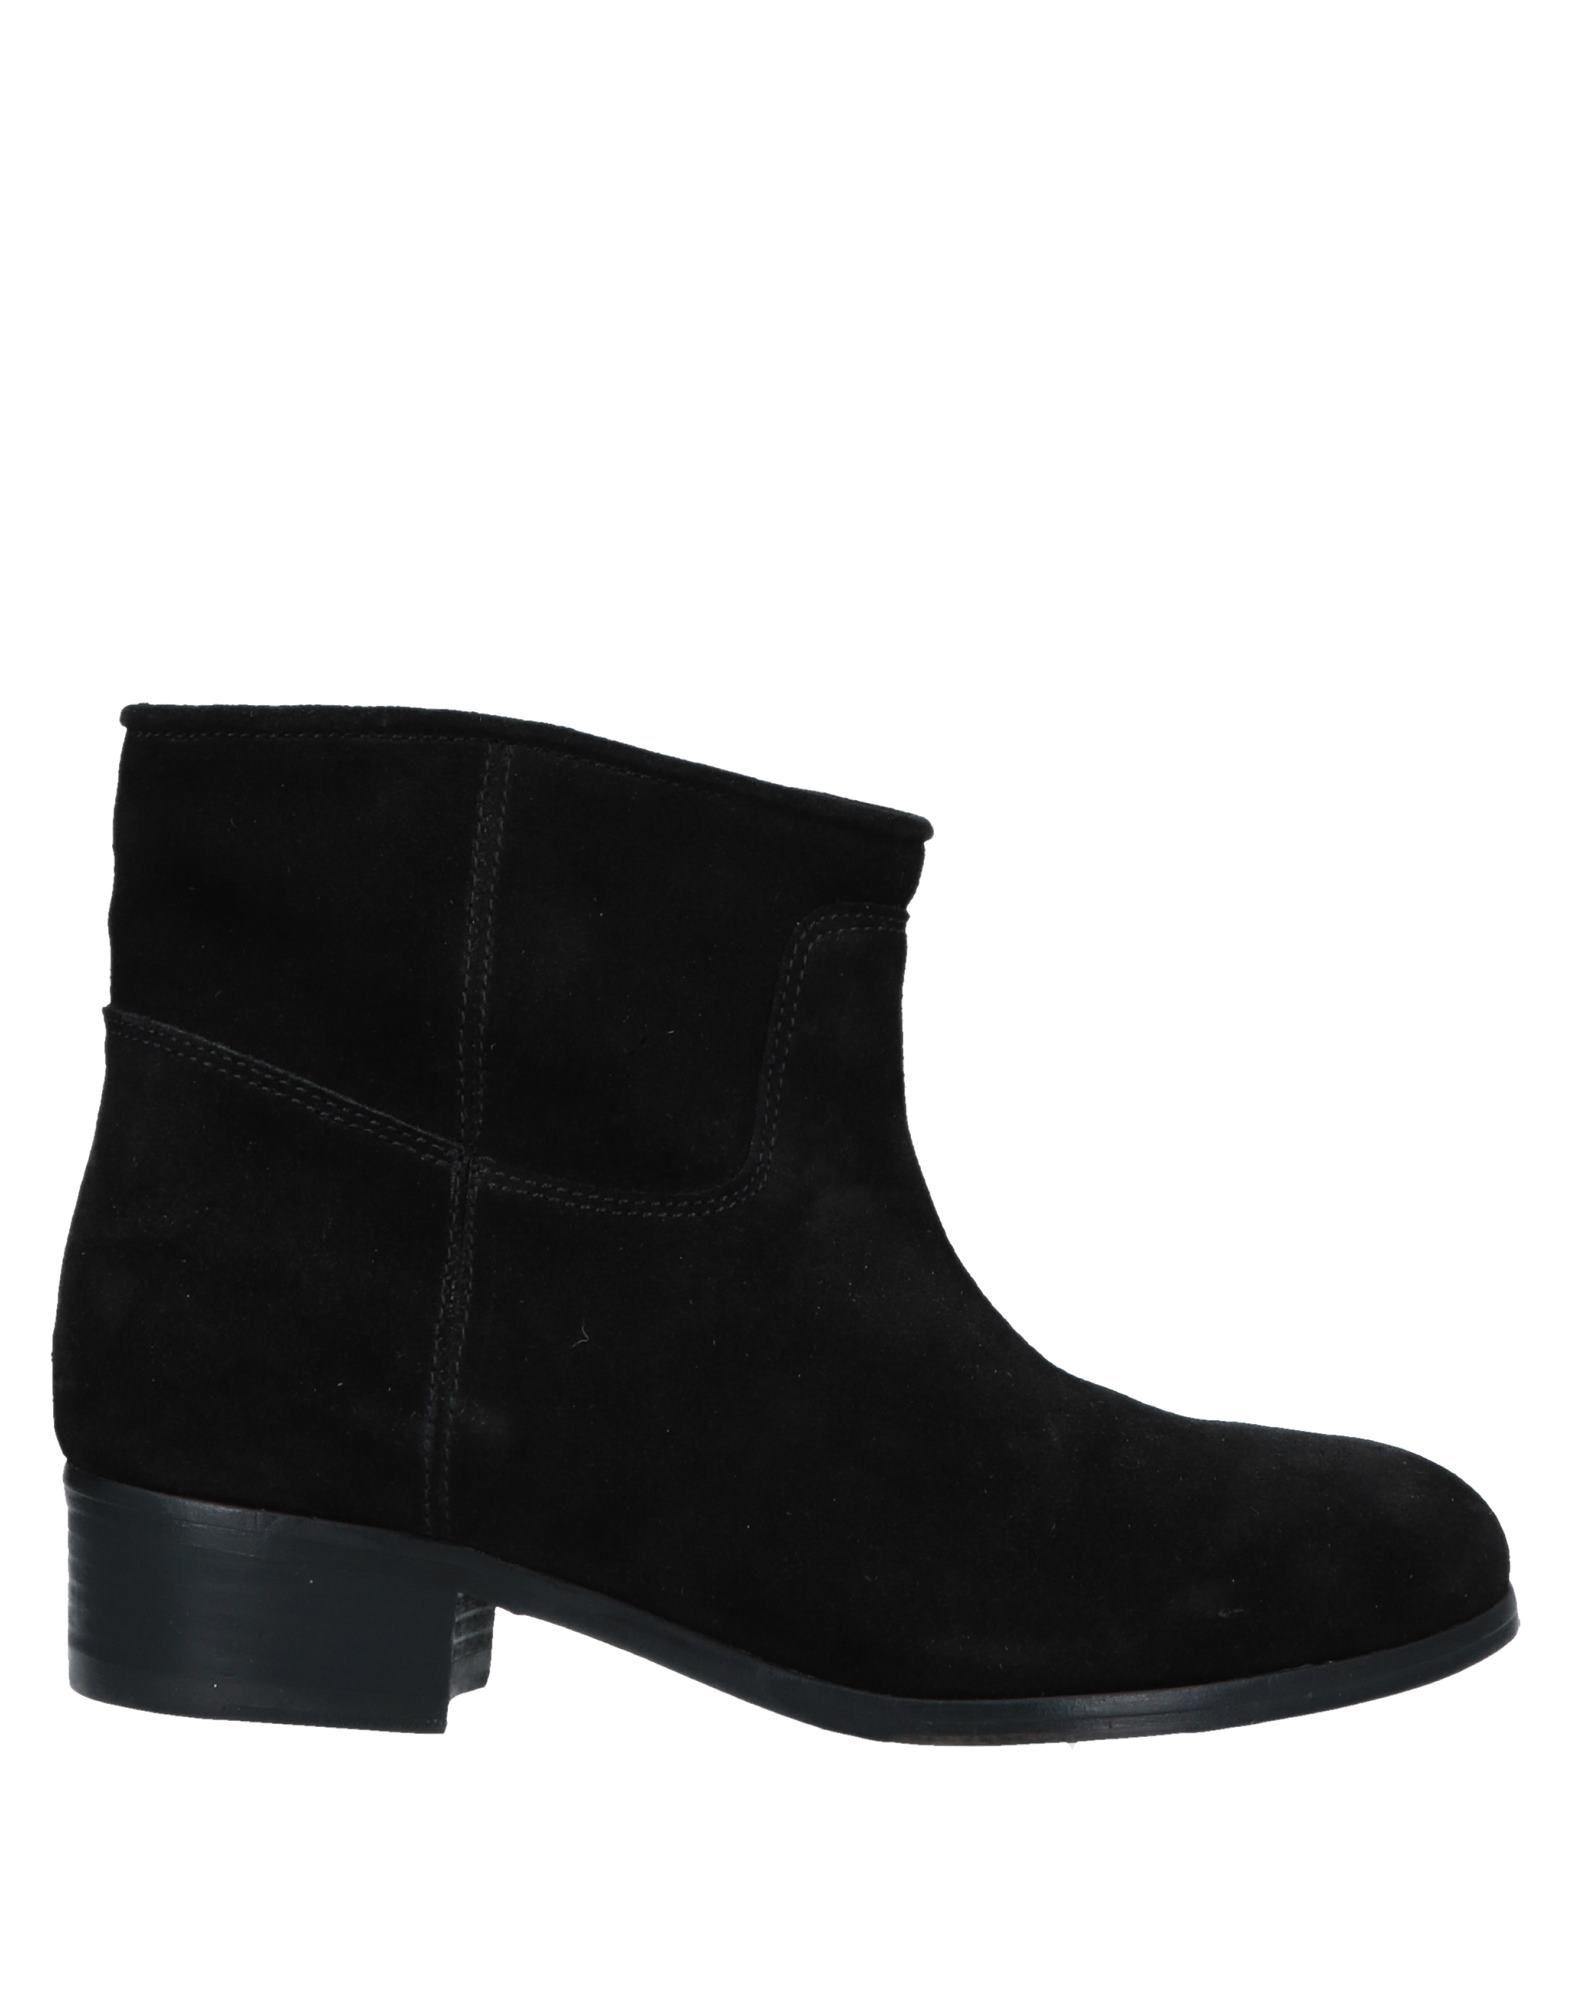 177fbc19cb9 Camper - Γυναικείες Μπότες-Μποτάκια - Σελίδα 5 | Outfit.gr